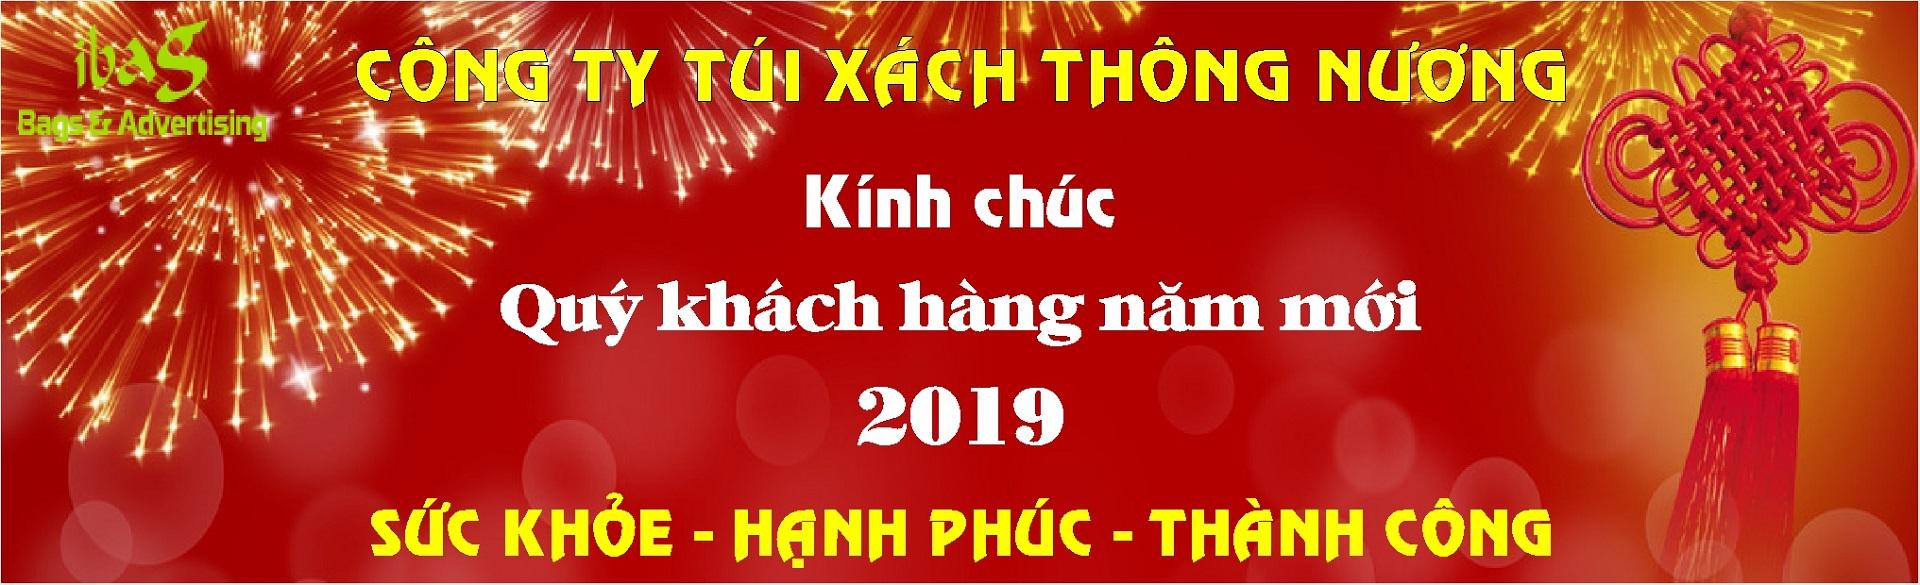 2019-chuc-mung-nam-moi